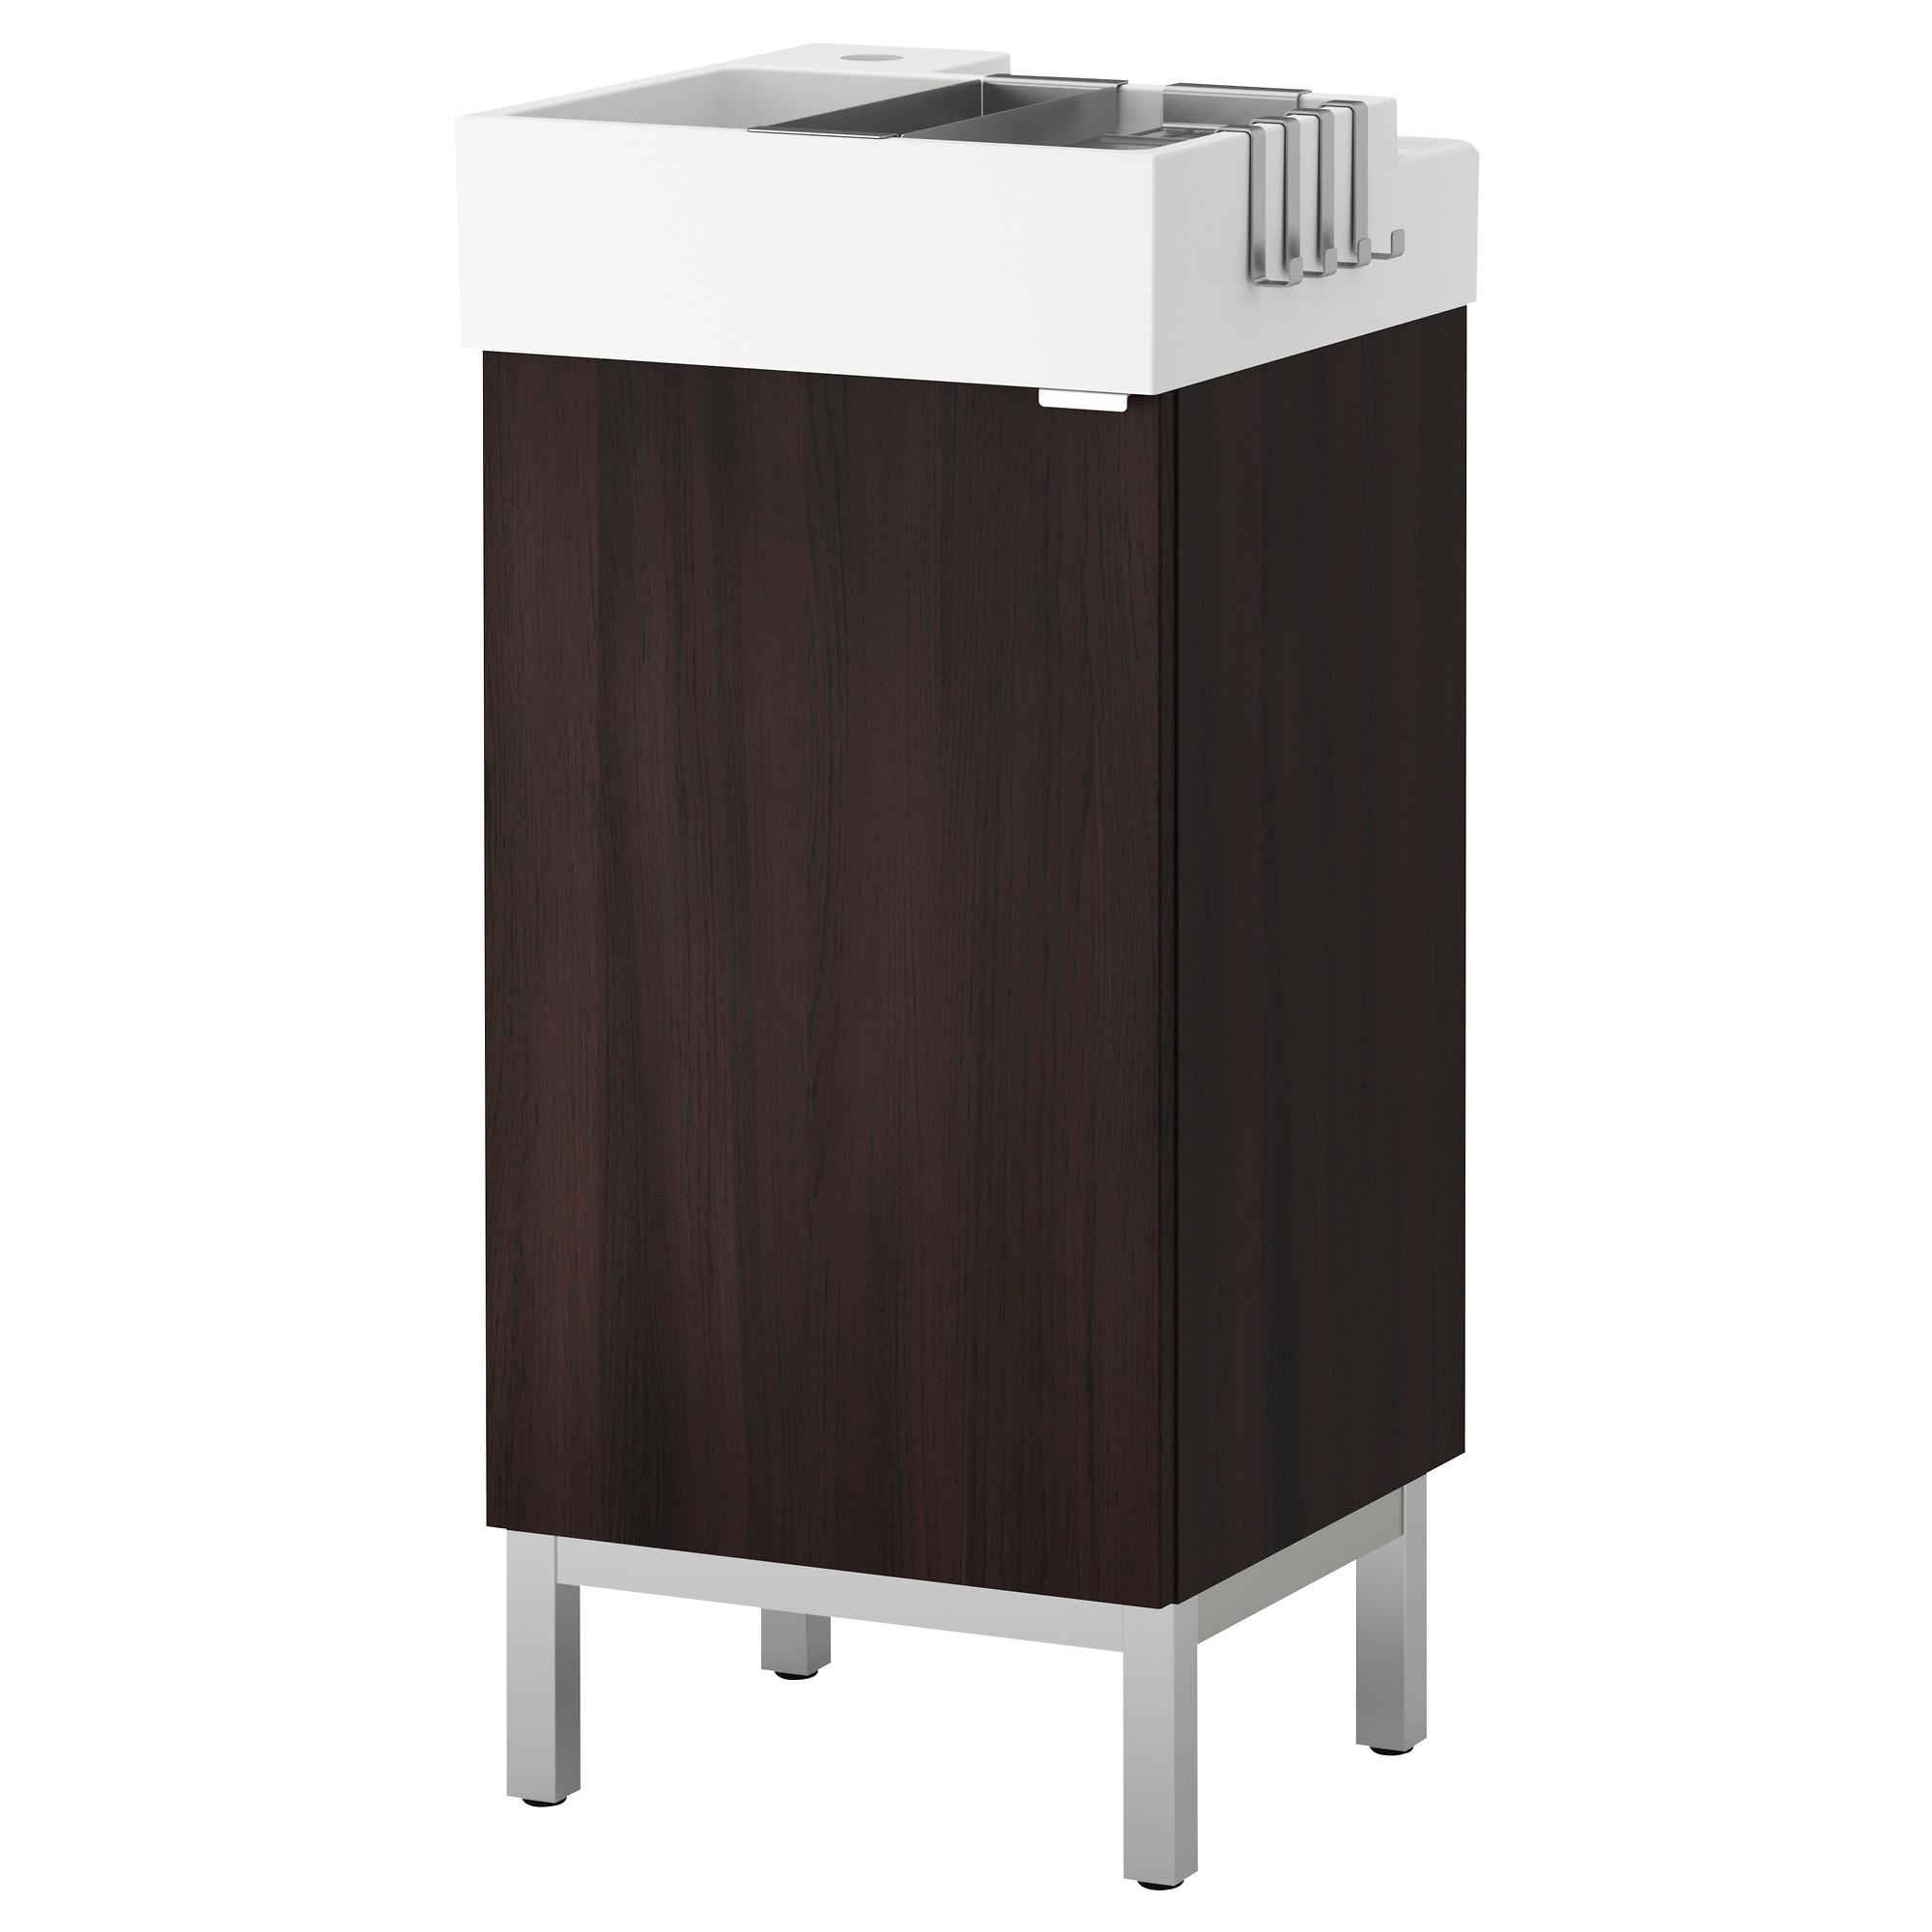 Lill ngen armario lavabo 1 puerta - Armario lavabo ikea ...